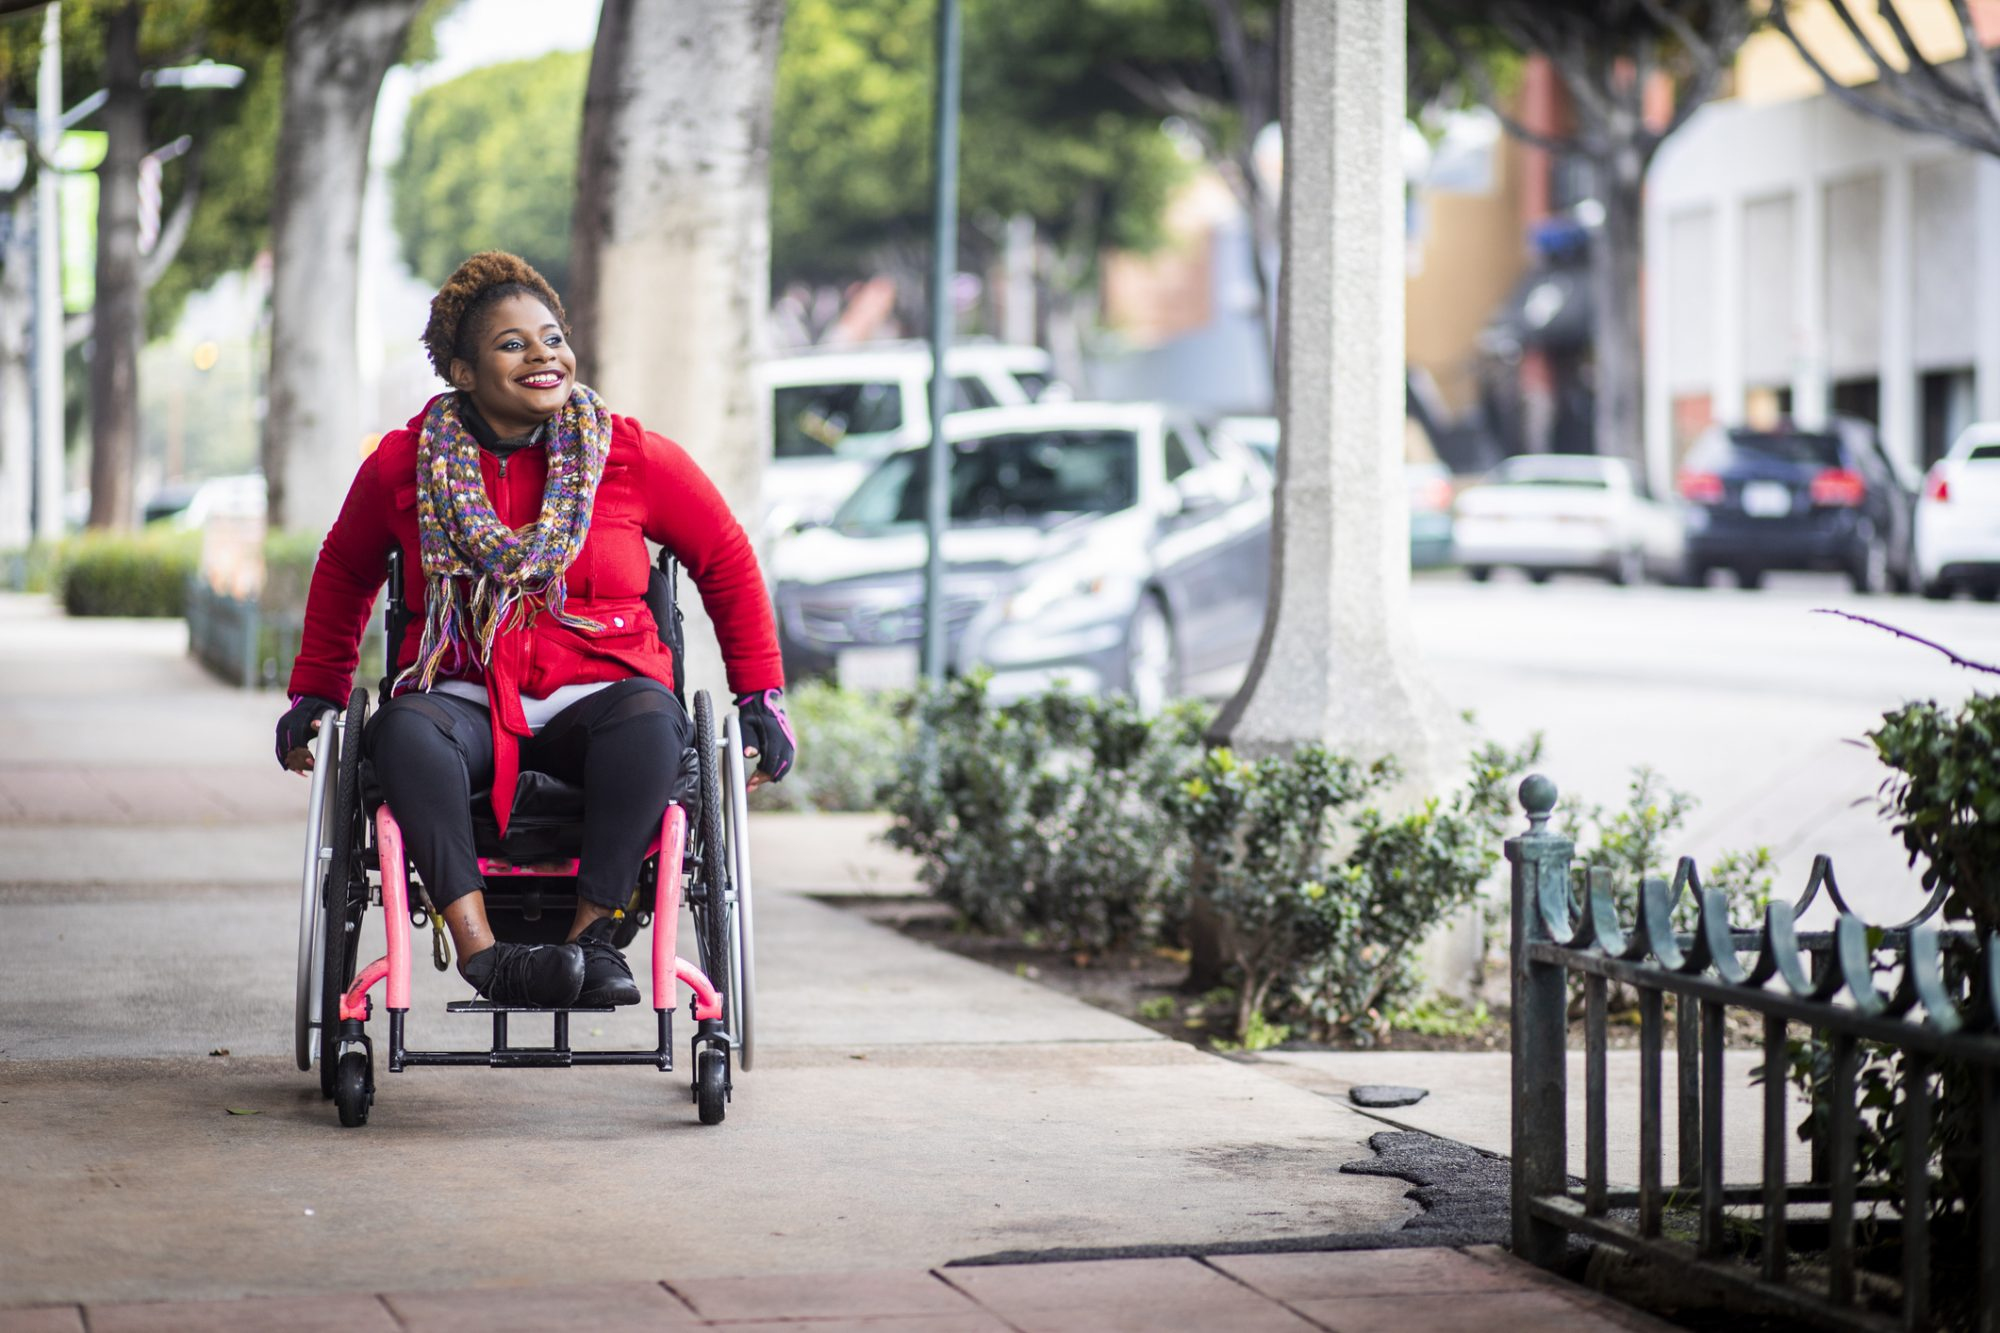 A woman rolling her wheelchair down the sidewalk in Boston